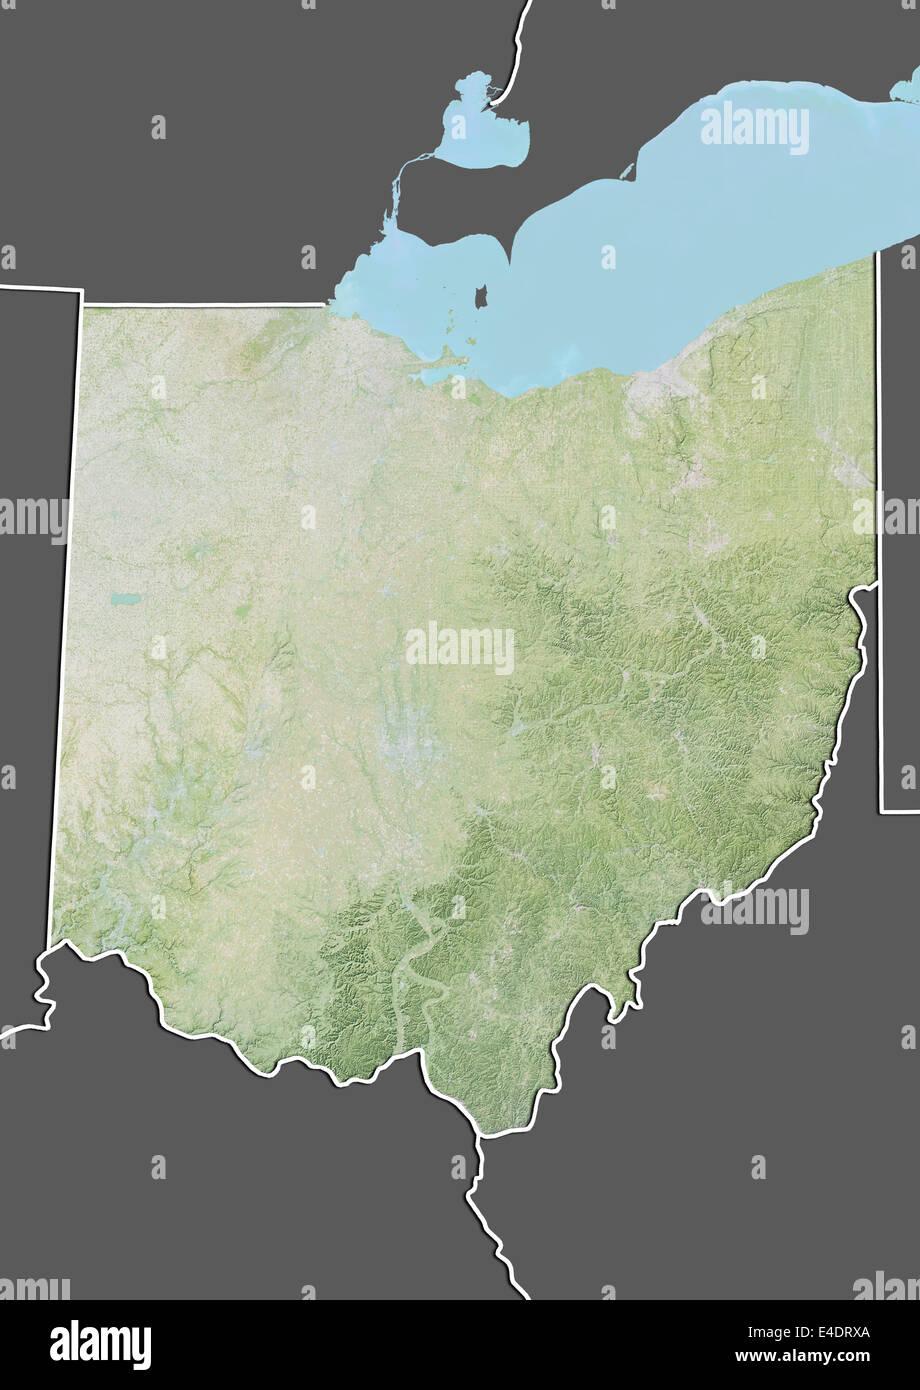 Map Satellite Geography Ohio Stock Photos & Map Satellite ... on airports of ohio, aerial maps ohio, digital map of ohio, detailed map of cleveland ohio, google map of ohio, road map of ohio, map of the ohio, topographical map of ohio, weather of ohio, large maps of ohio, seismic map of ohio, coordinates of ohio, map of downtown columbus ohio, pdf map of ohio, united states of ohio, village of ohio, physical map of ohio, aerial view of belle valley ohio, northfield center ohio, elevation of ohio,